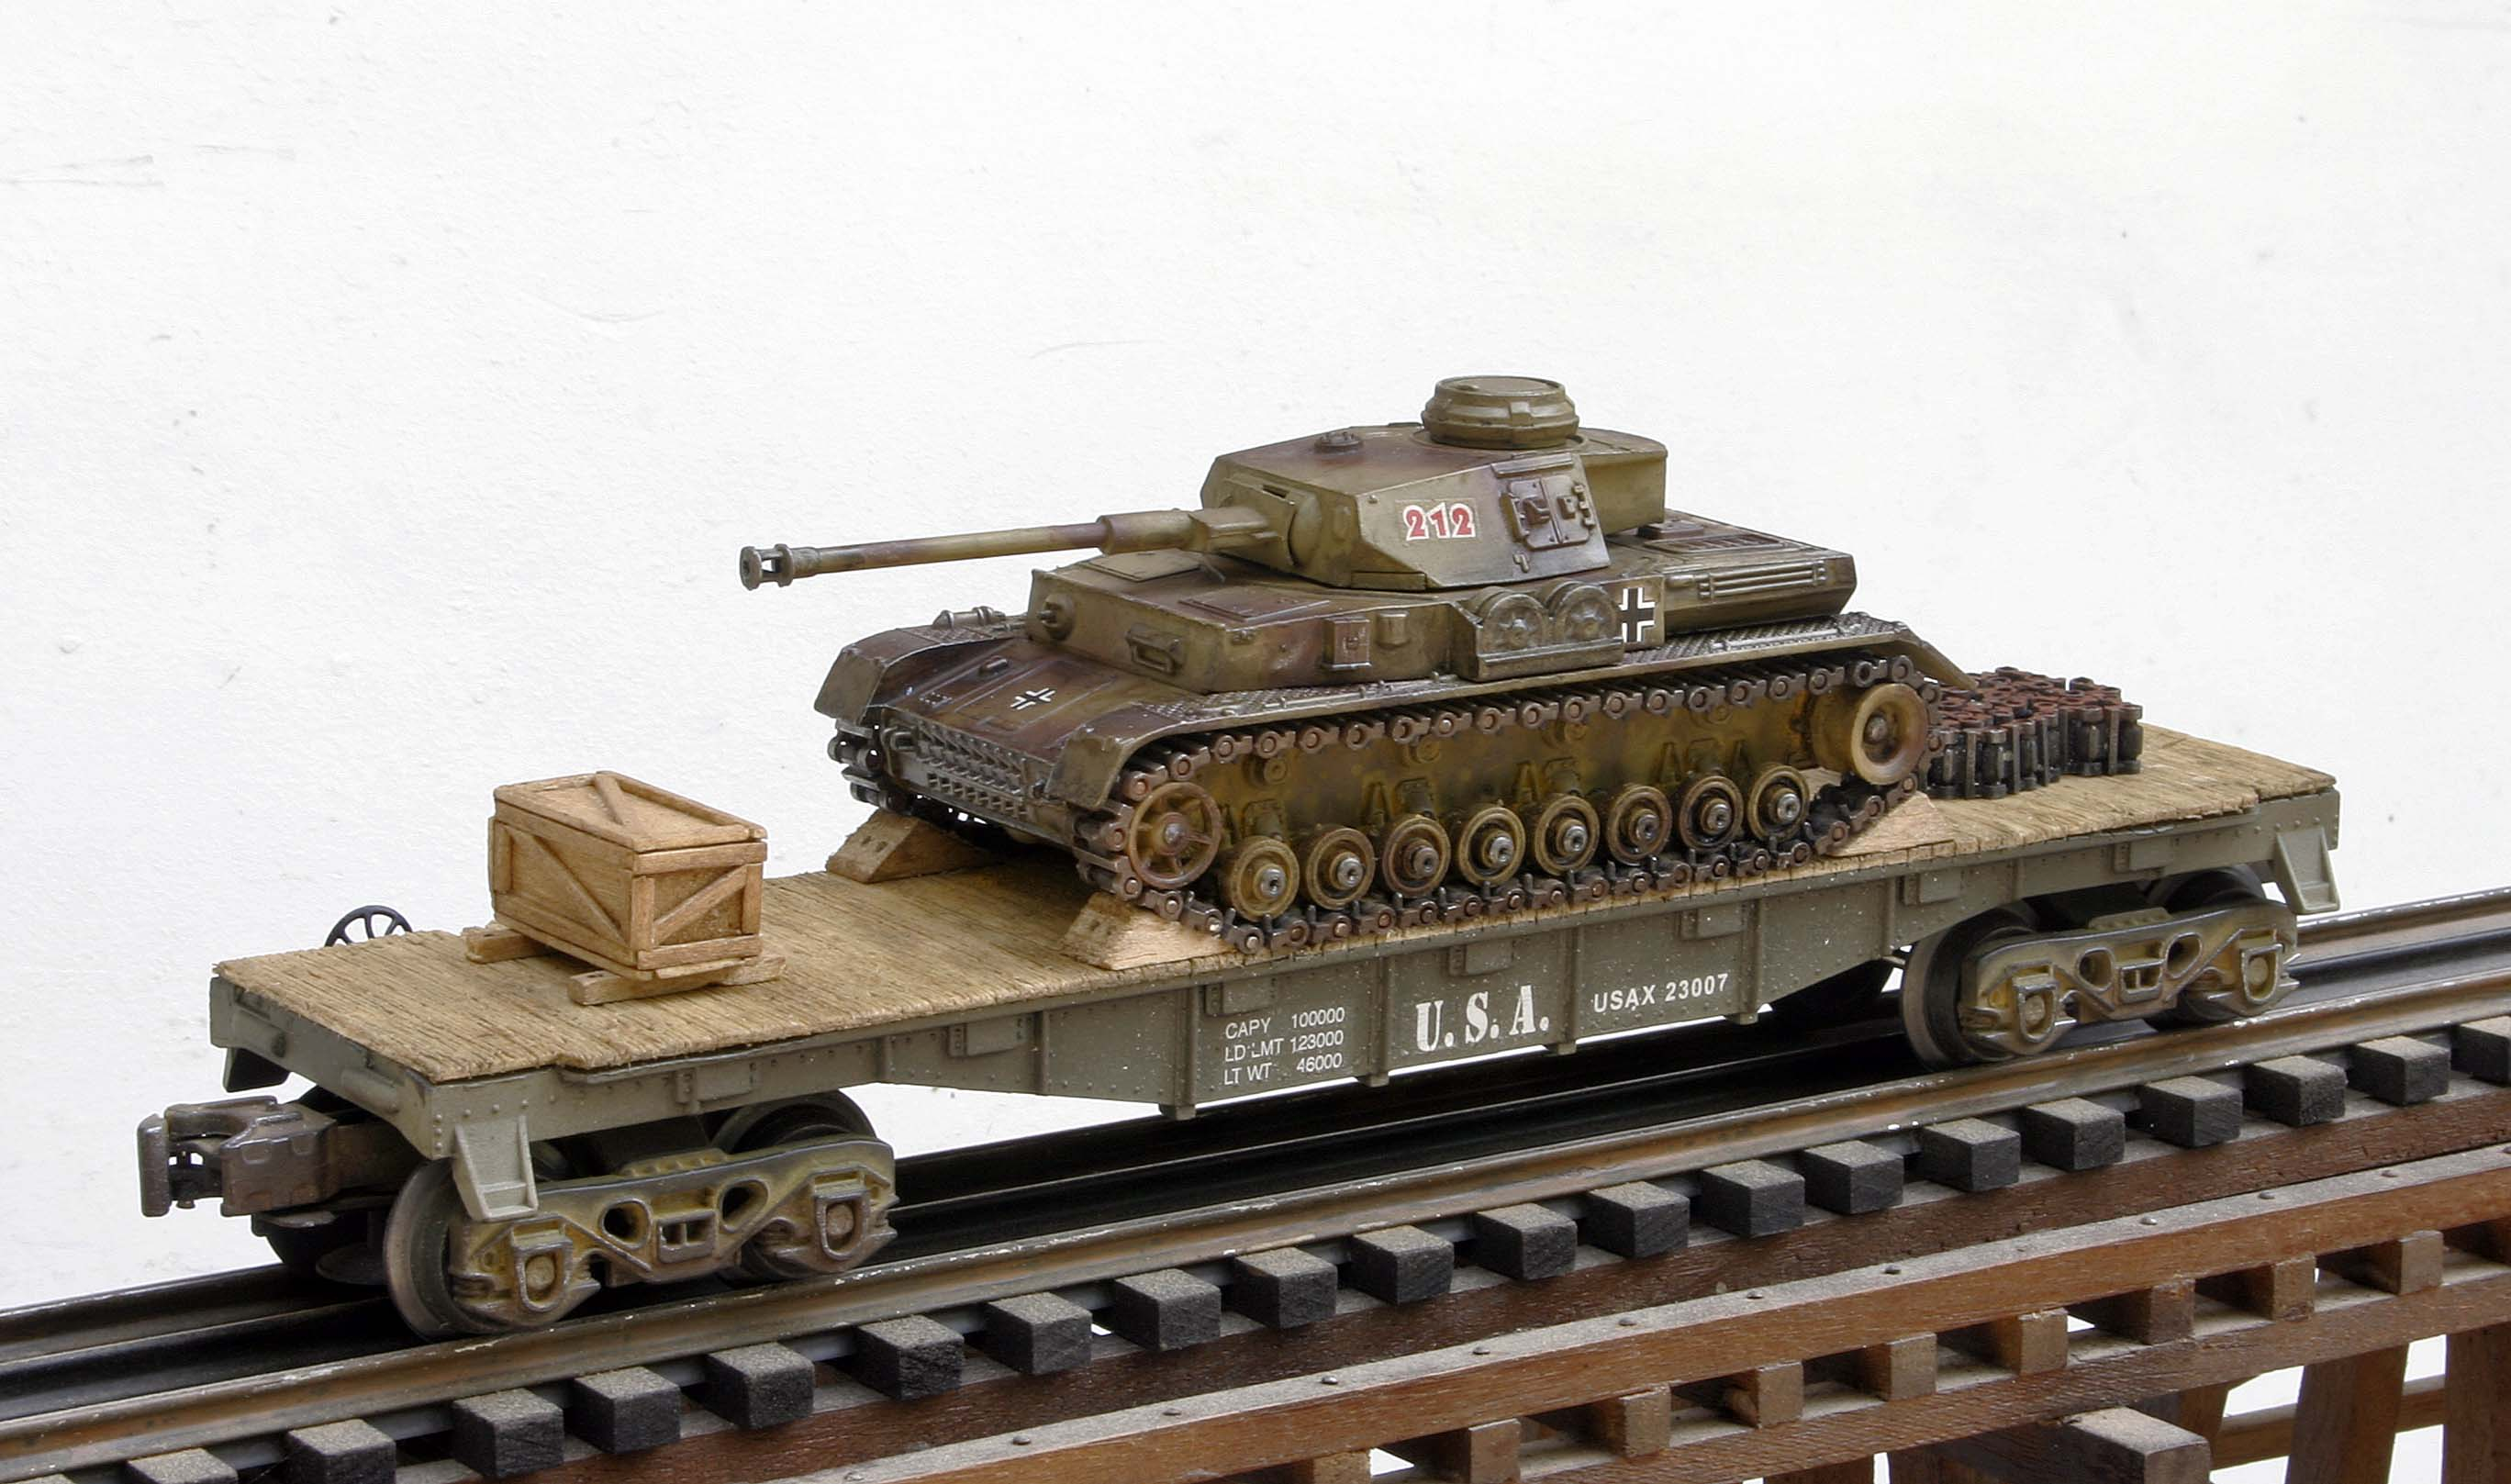 Platform1346 - WWII Train Car Turned Luxe Overnight Rental ...  Wwii Train Car